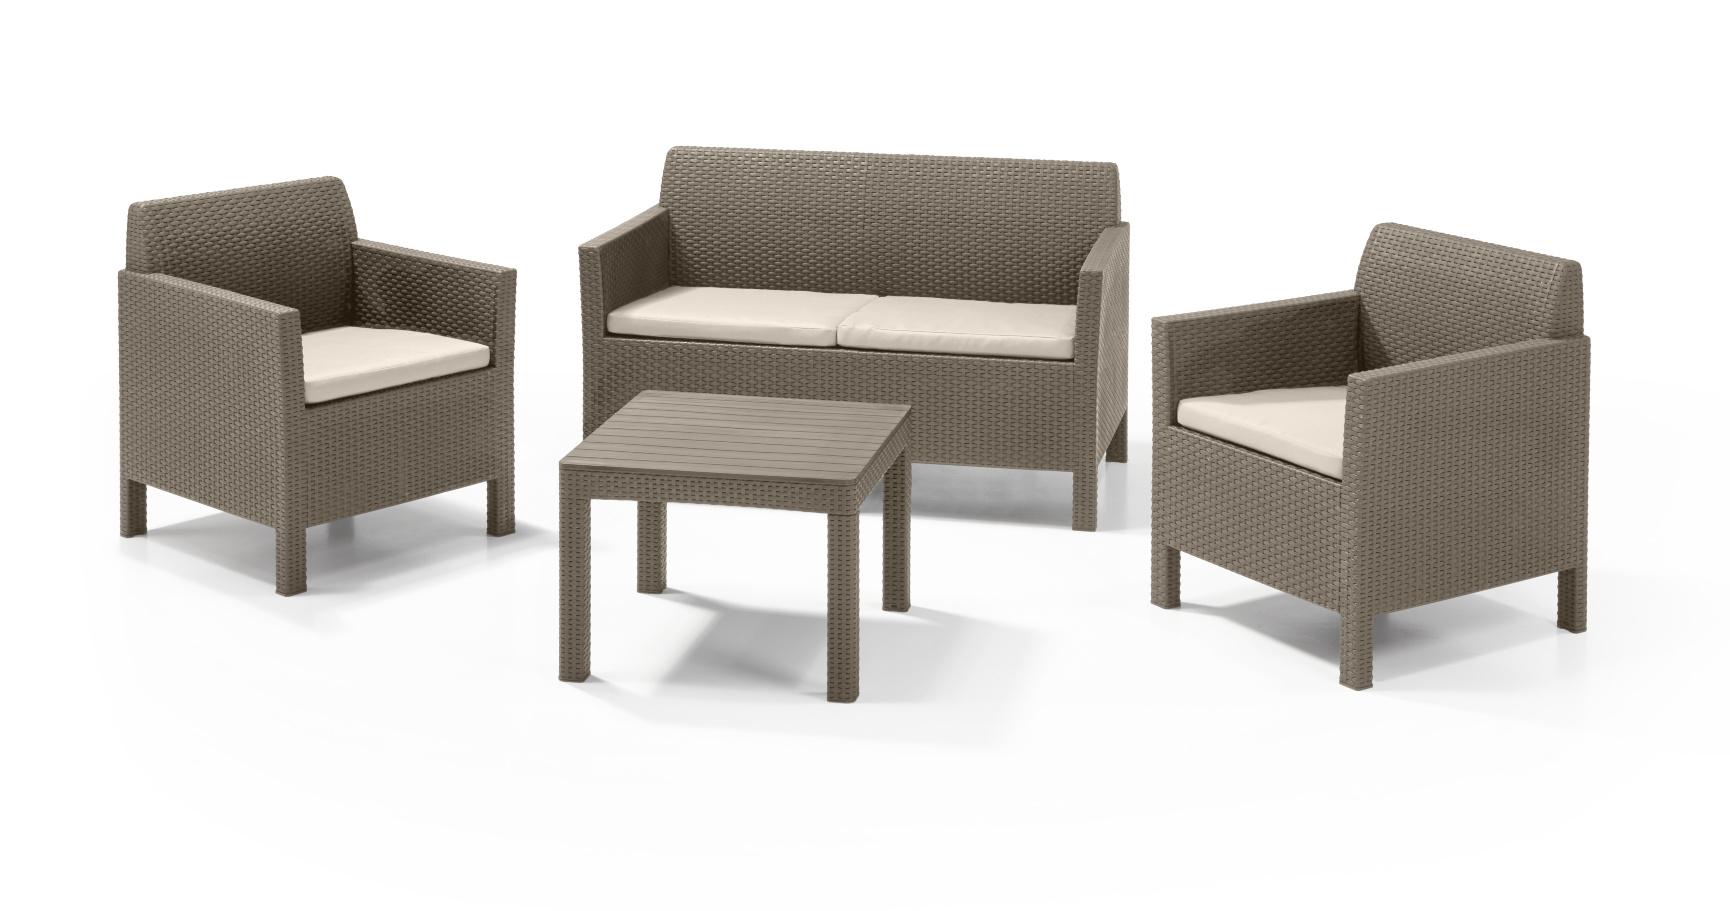 Loungeset | Lounge sets - Allibert